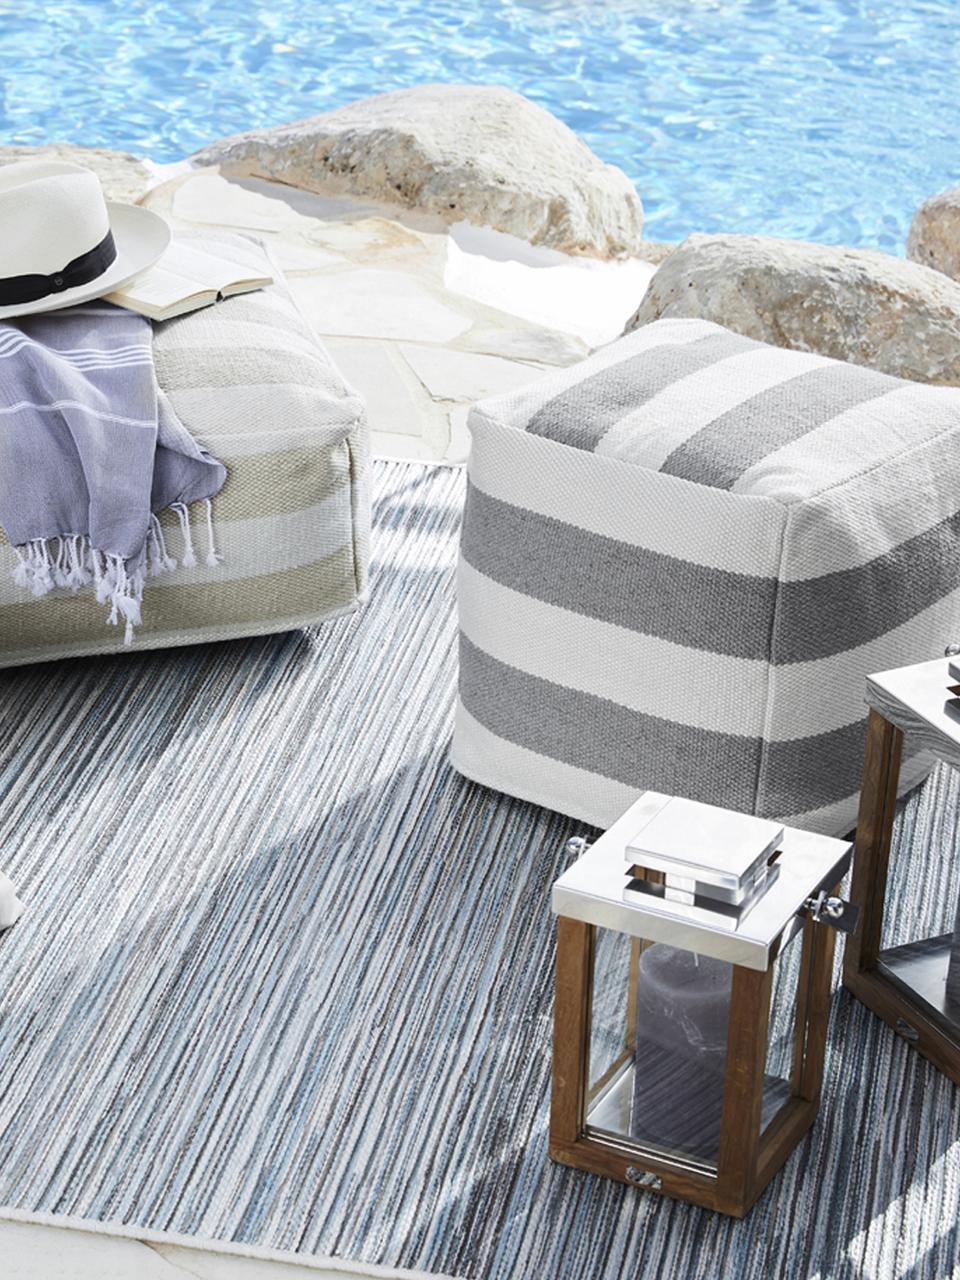 In- und Outdoor-Pouf Lani, Bezug: 100% recyceltes Polyester, Grau, Ecru, 40 x 40 cm